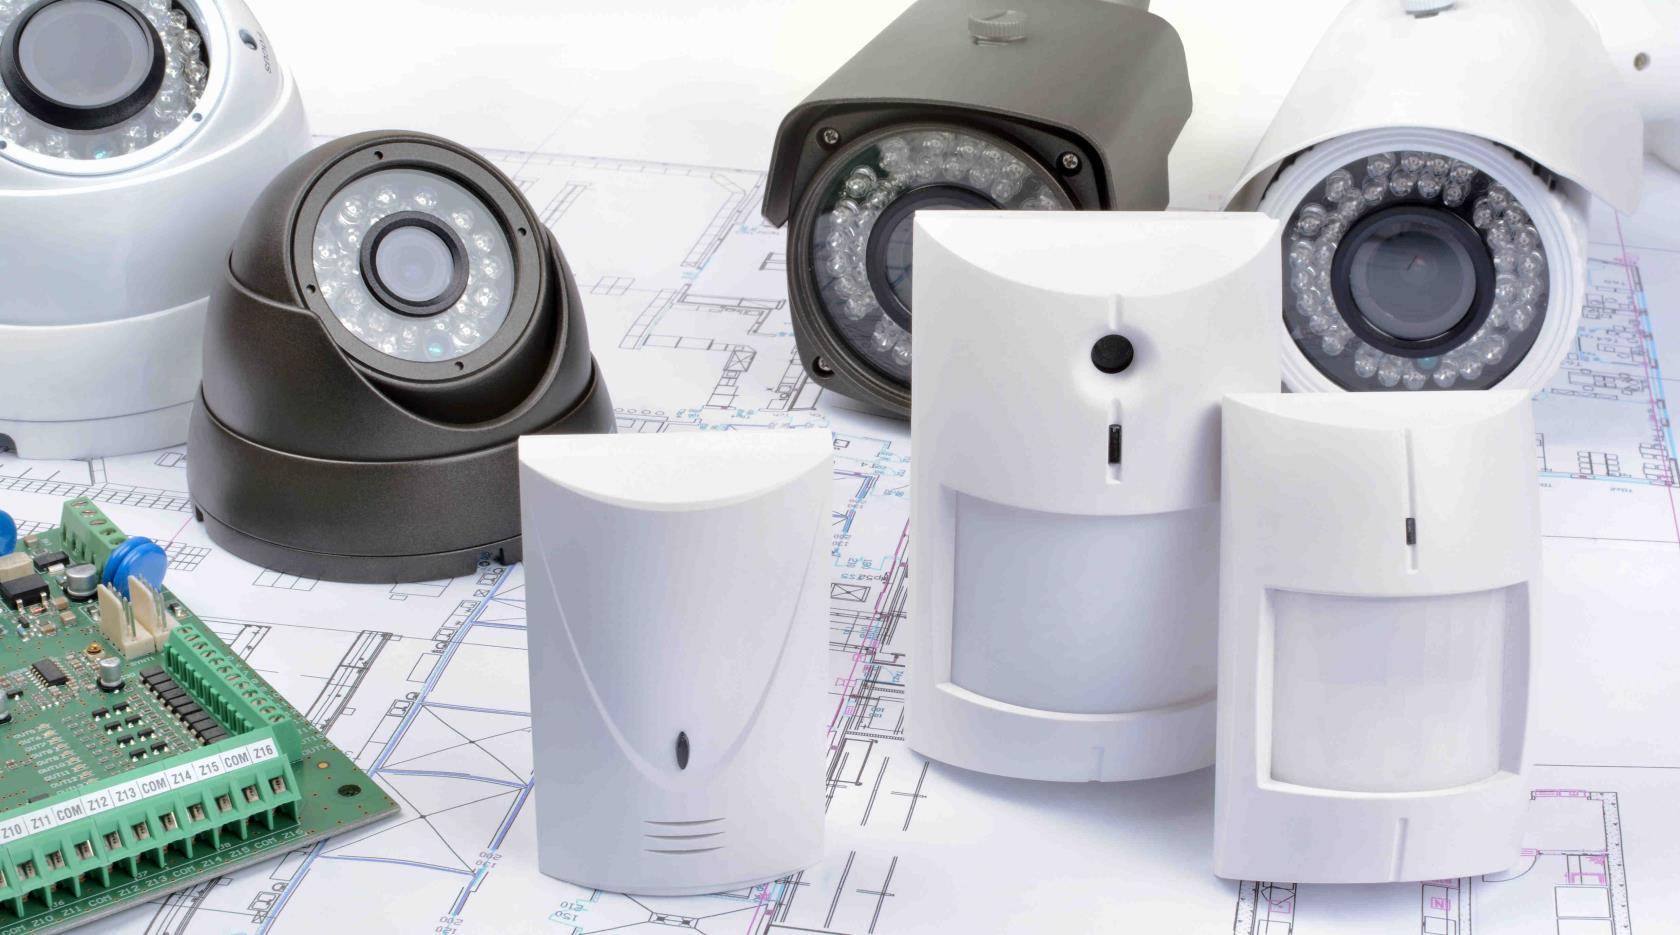 impianti antifurto videosorveglianza